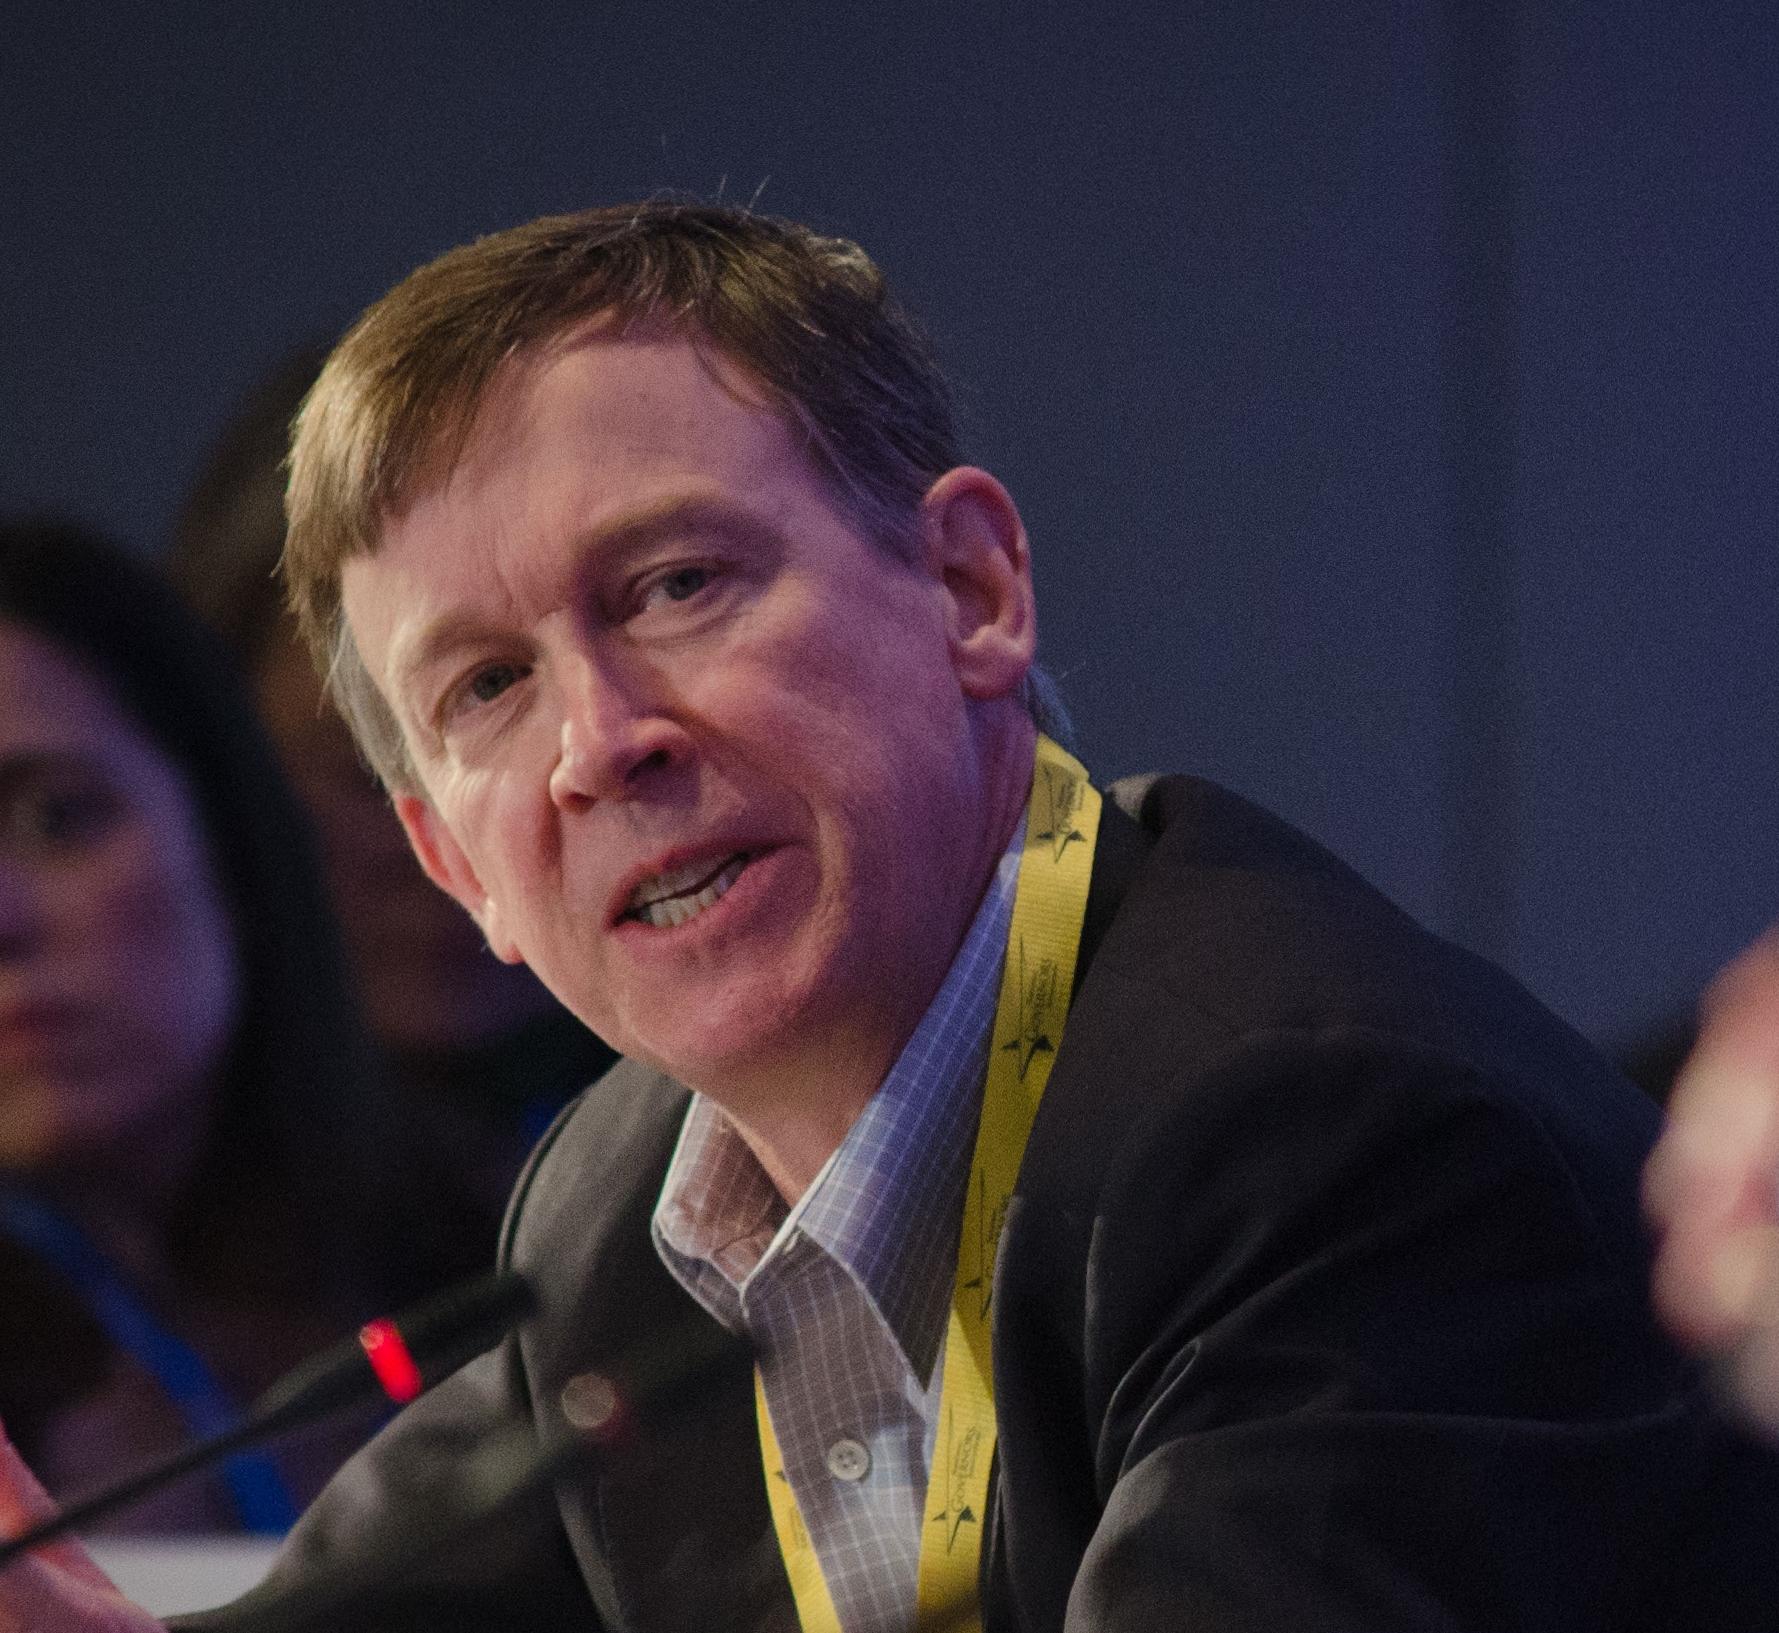 Colorado Governor Hickenlooper Advises California on Legalization